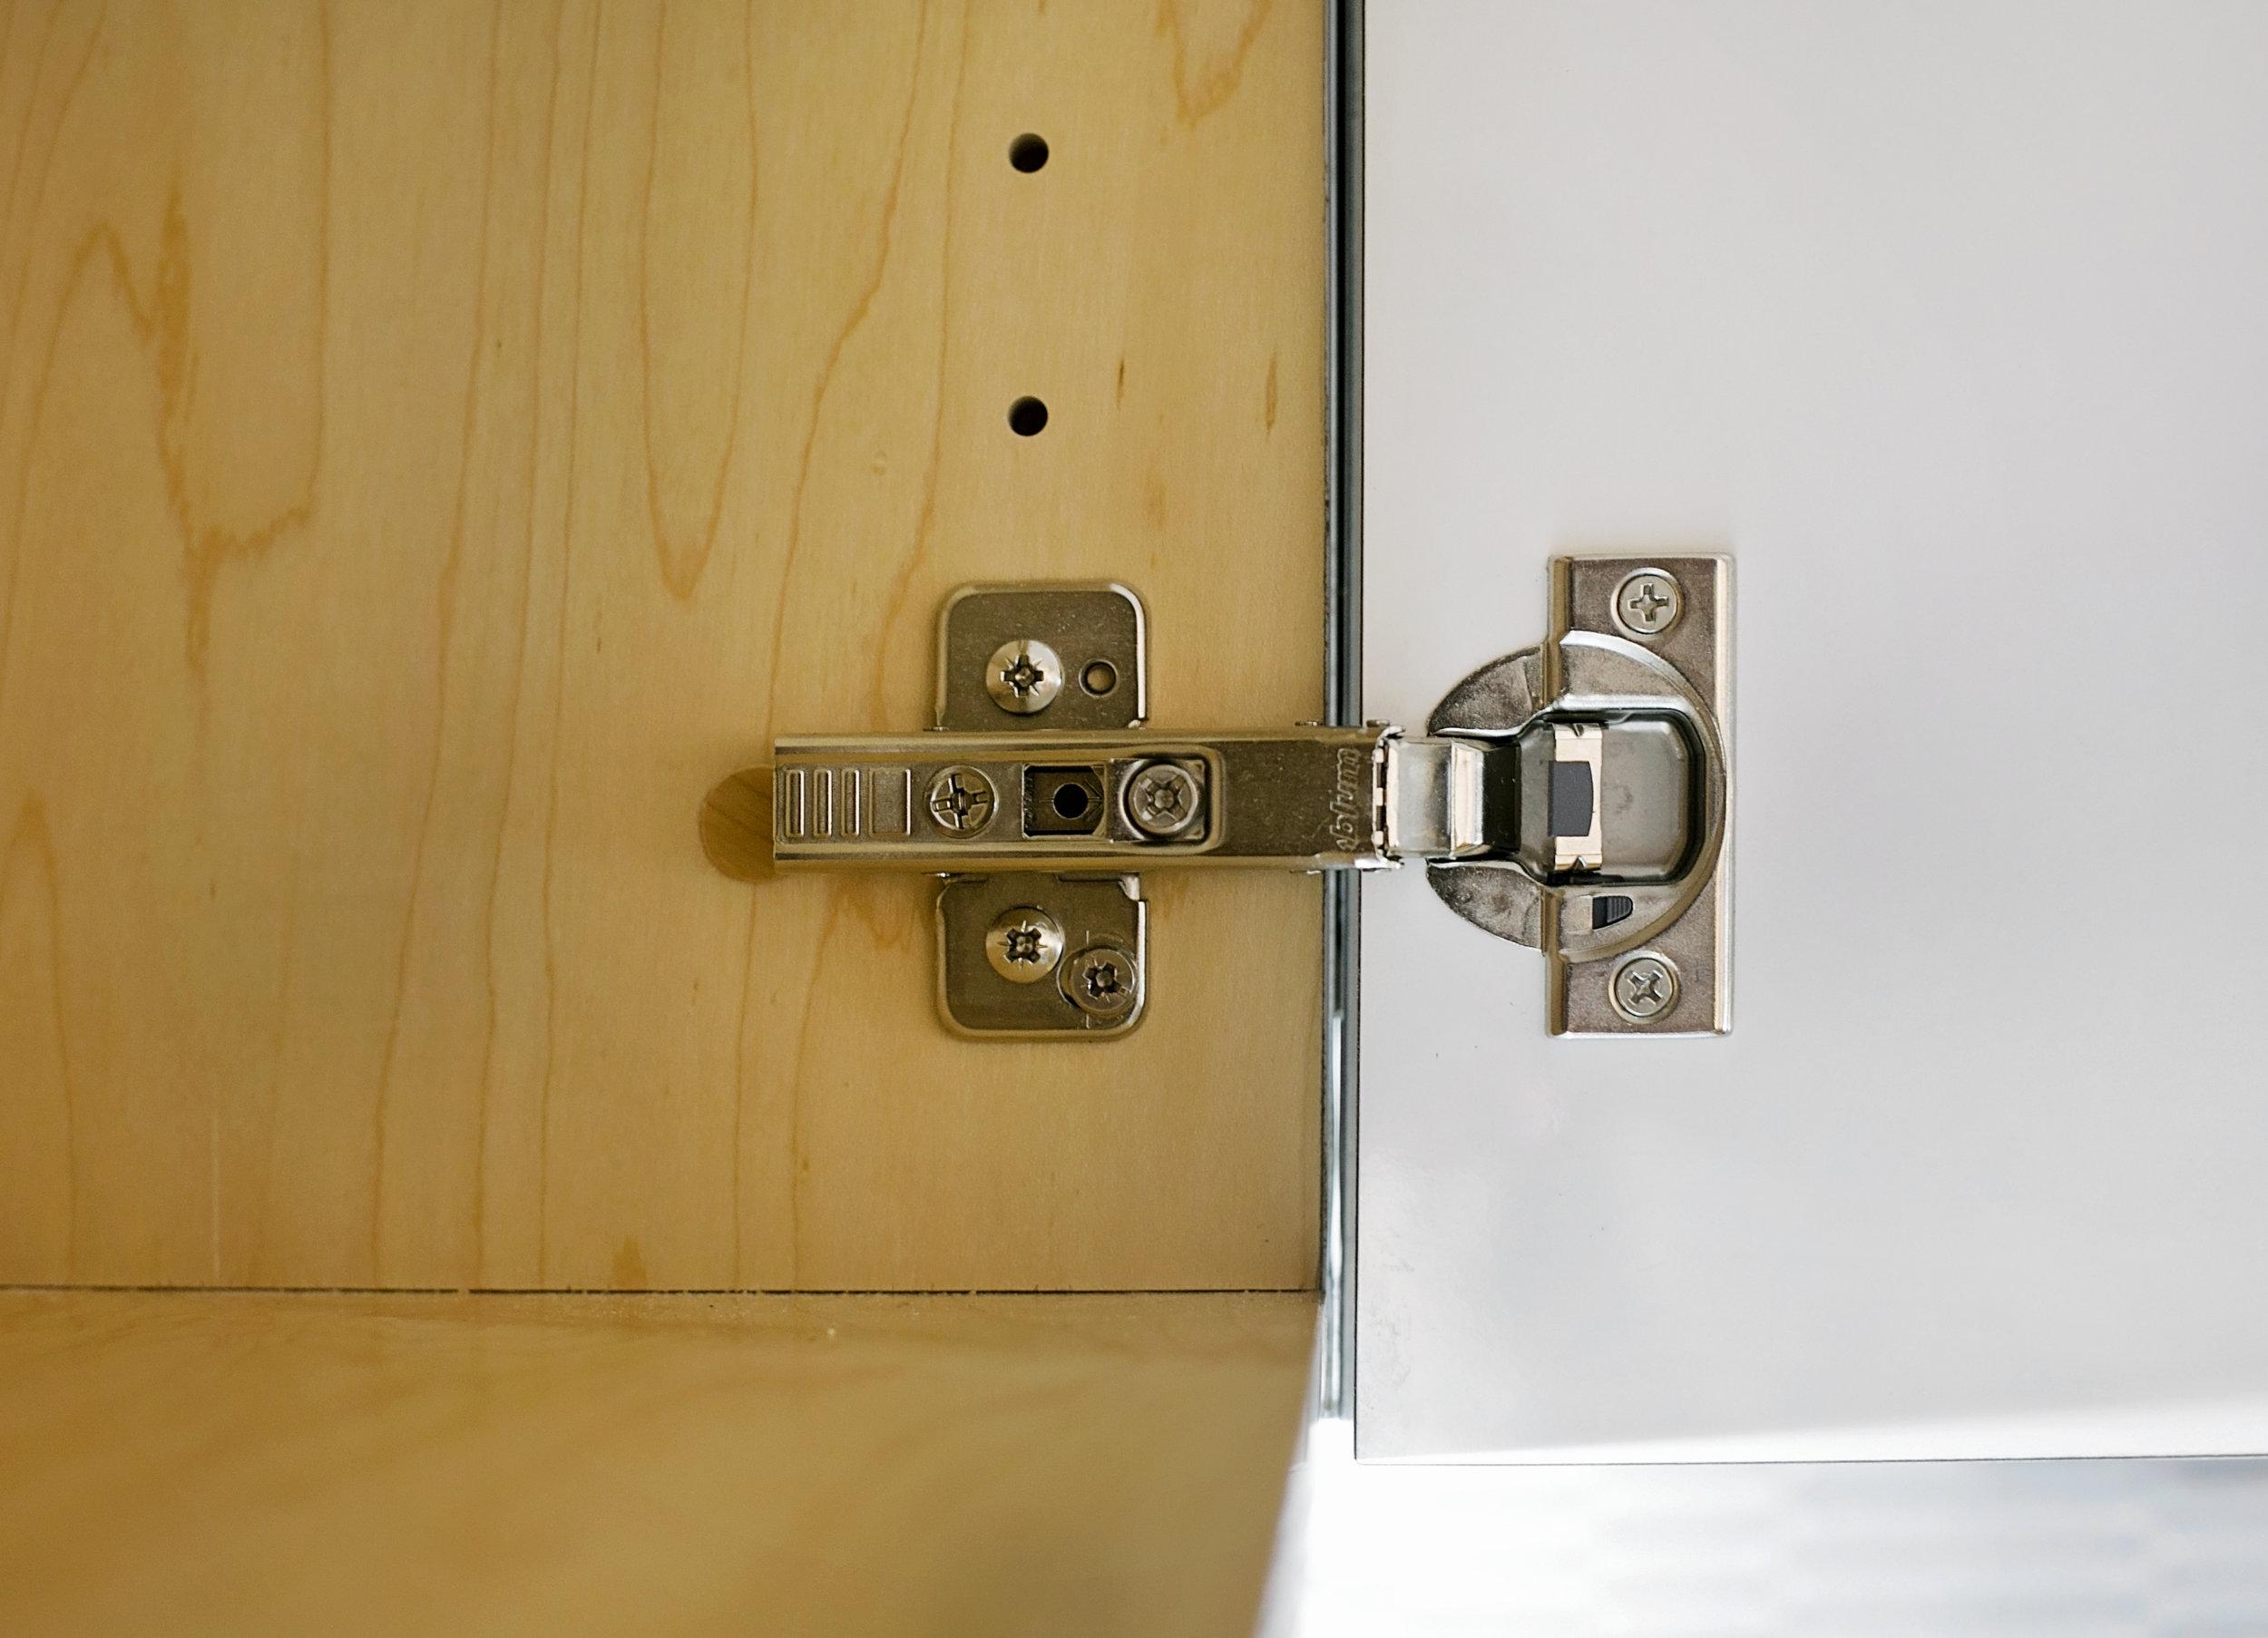 hardware - We can repair or upgrade bathroom hinges and drawers tracks.